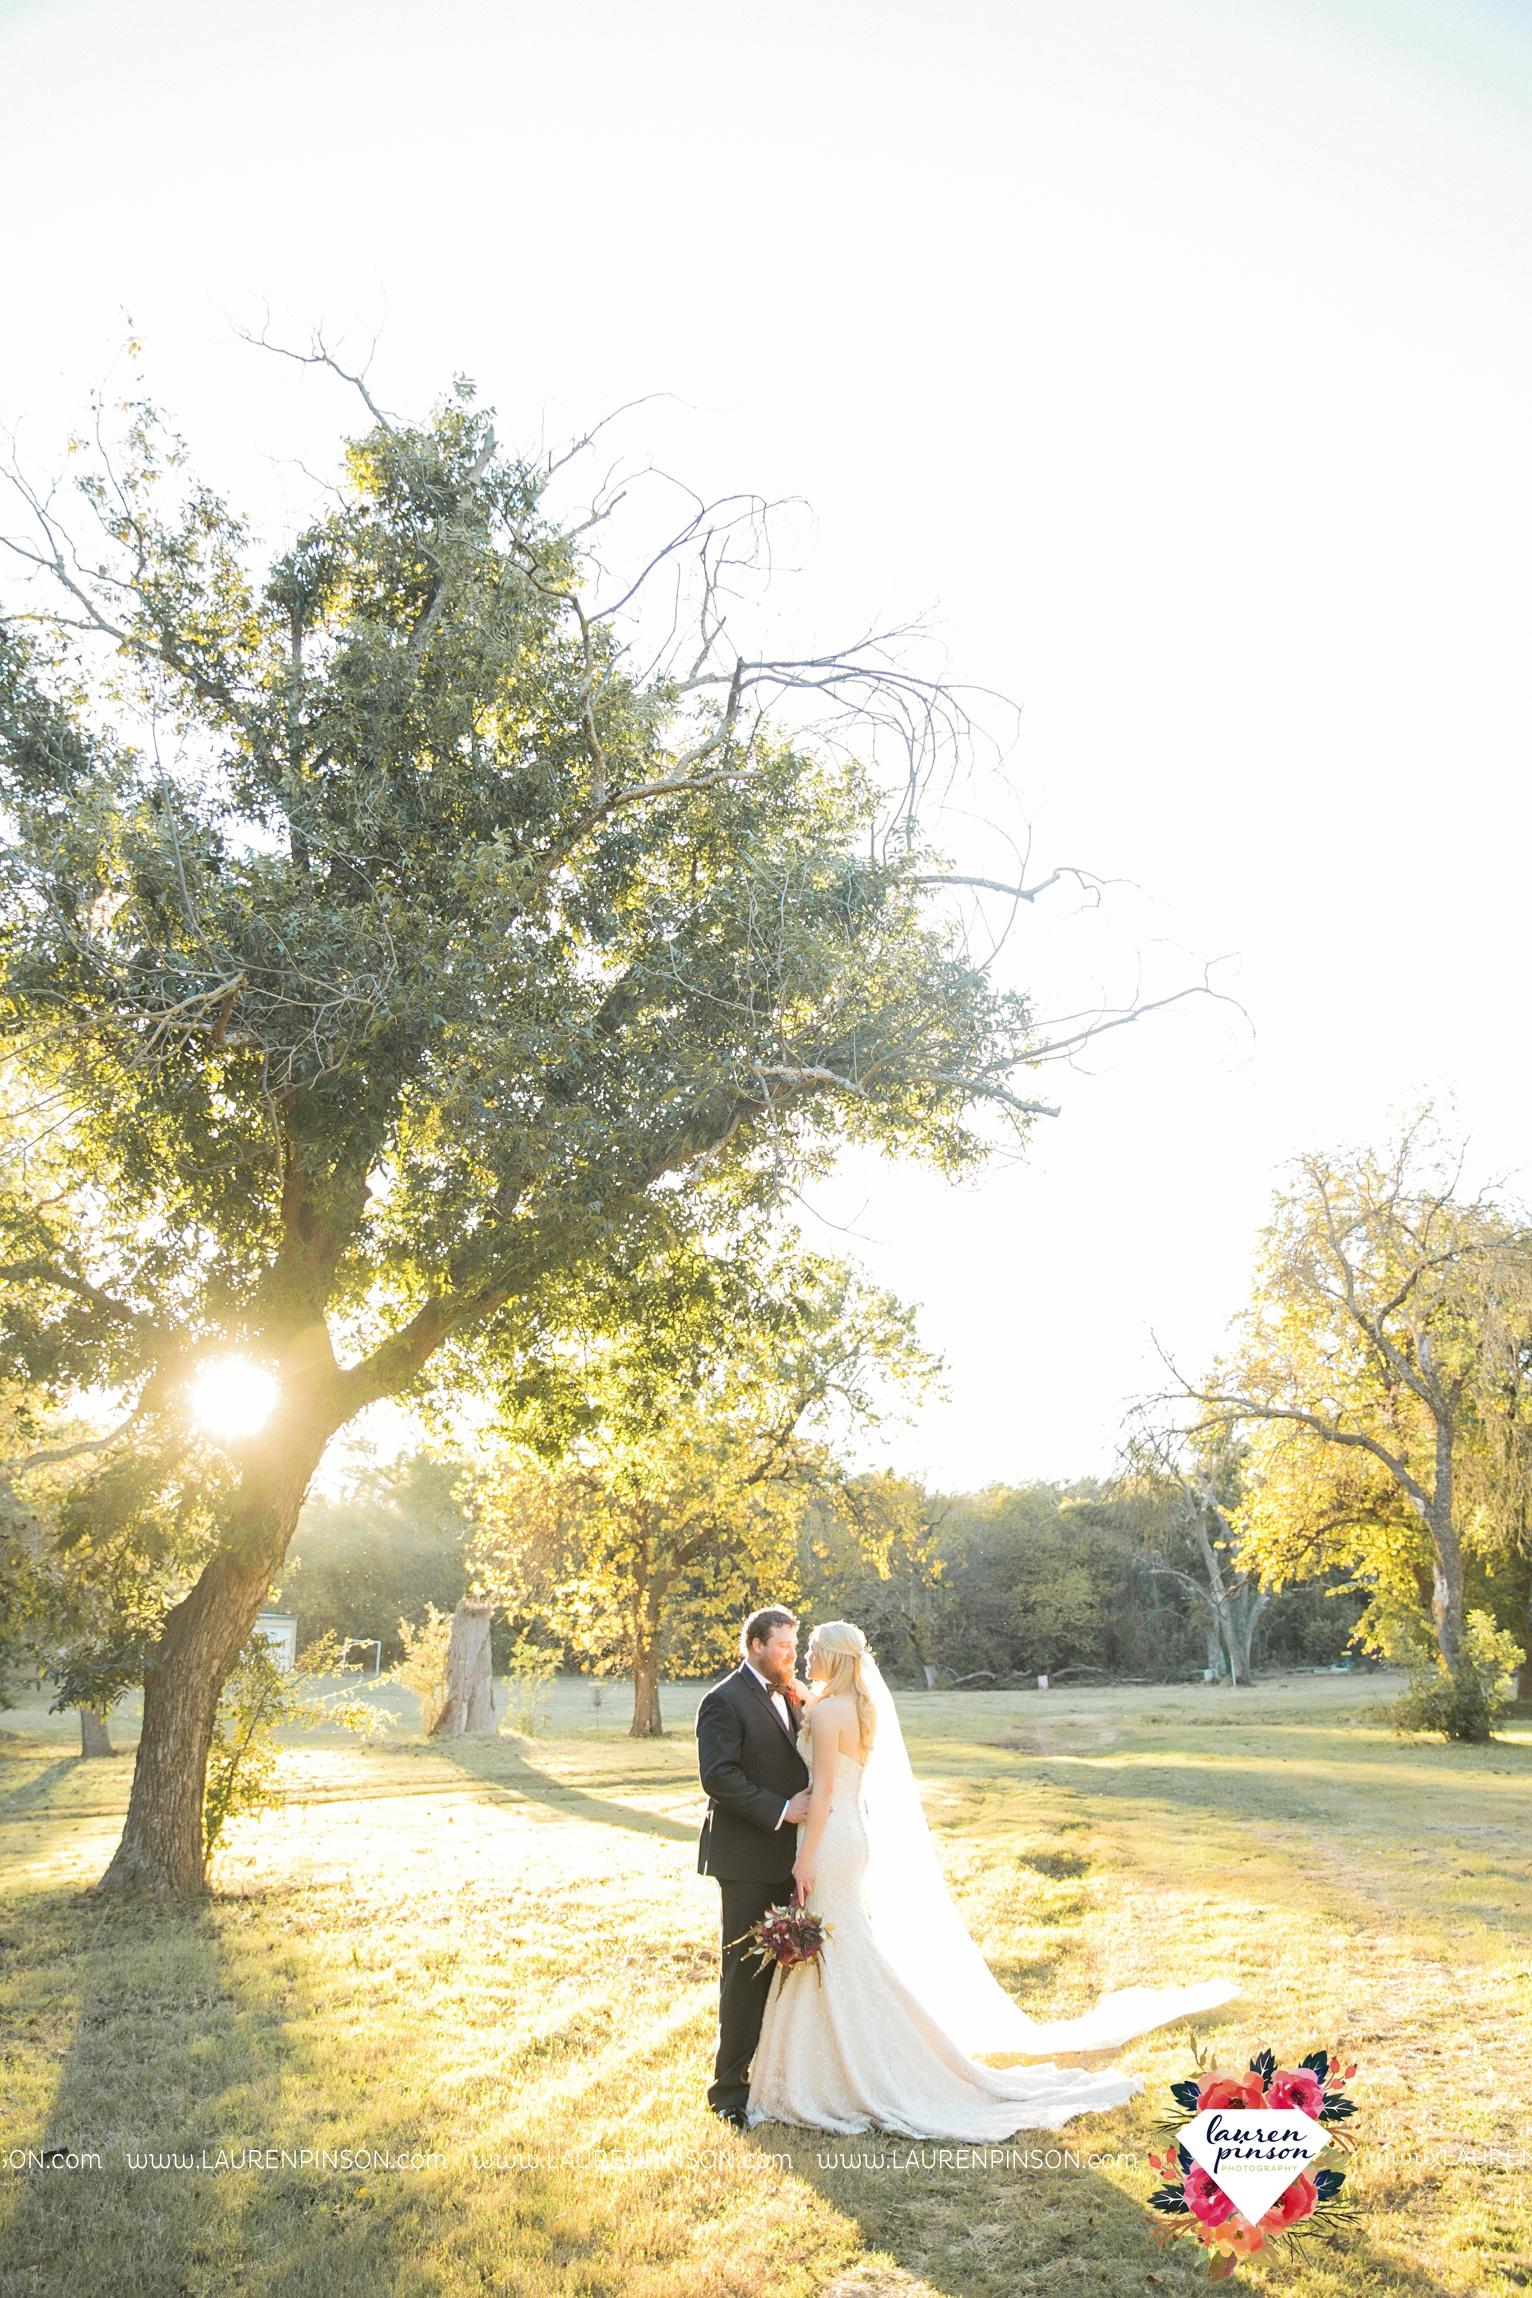 rustic-wichita-falls-texas-wedding-photographer-gold-glam-mayfield-events-market-street-united-allue-bridals-fall_1768.jpg